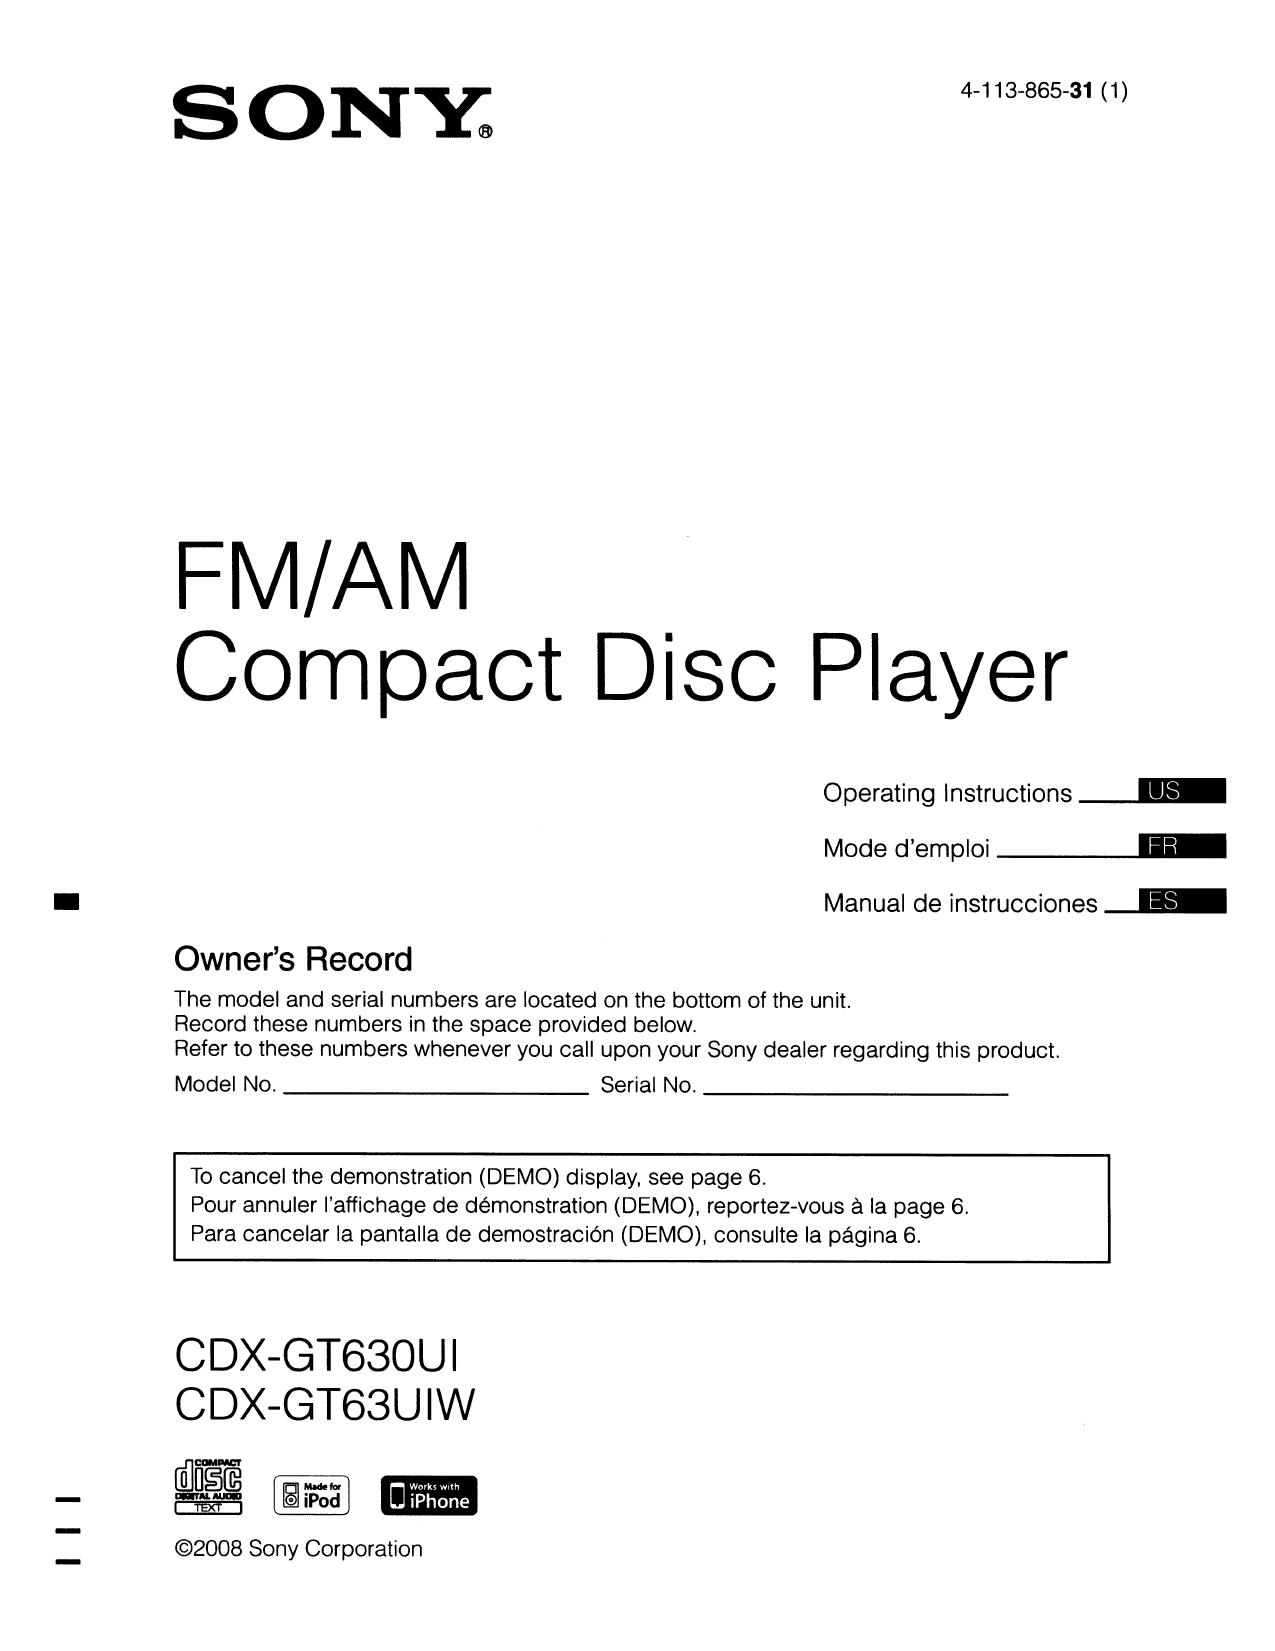 Wondrous Download Free Pdf For Sony Xplod Cdx Gt630Ui Car Receiver Manual Wiring Cloud Xortanetembamohammedshrineorg